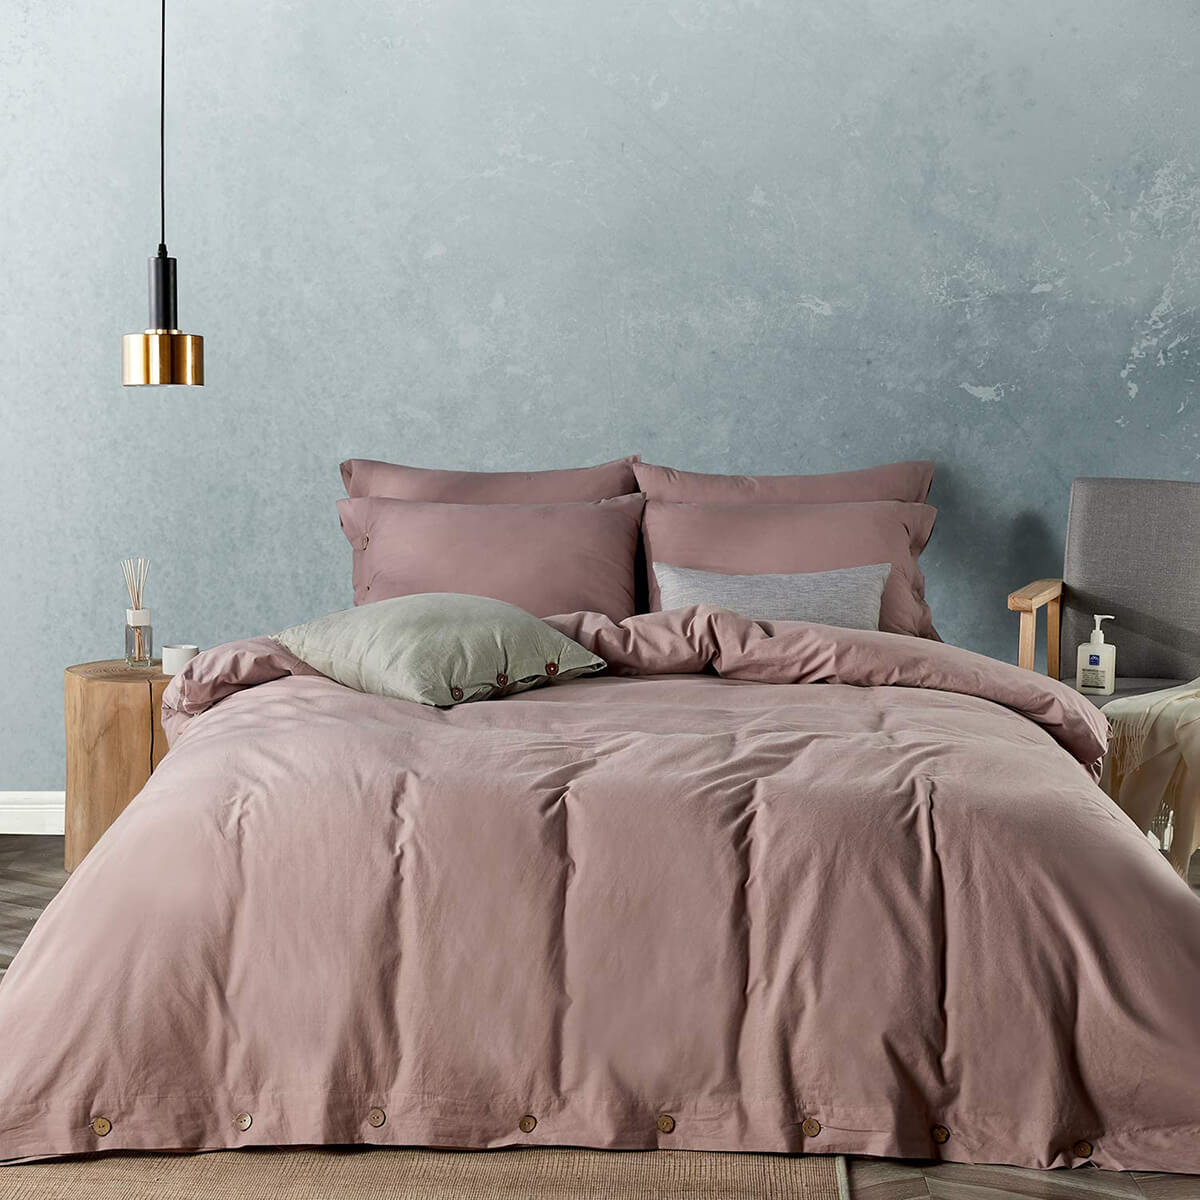 Dusty Rose Earth Tone Bedroom Design